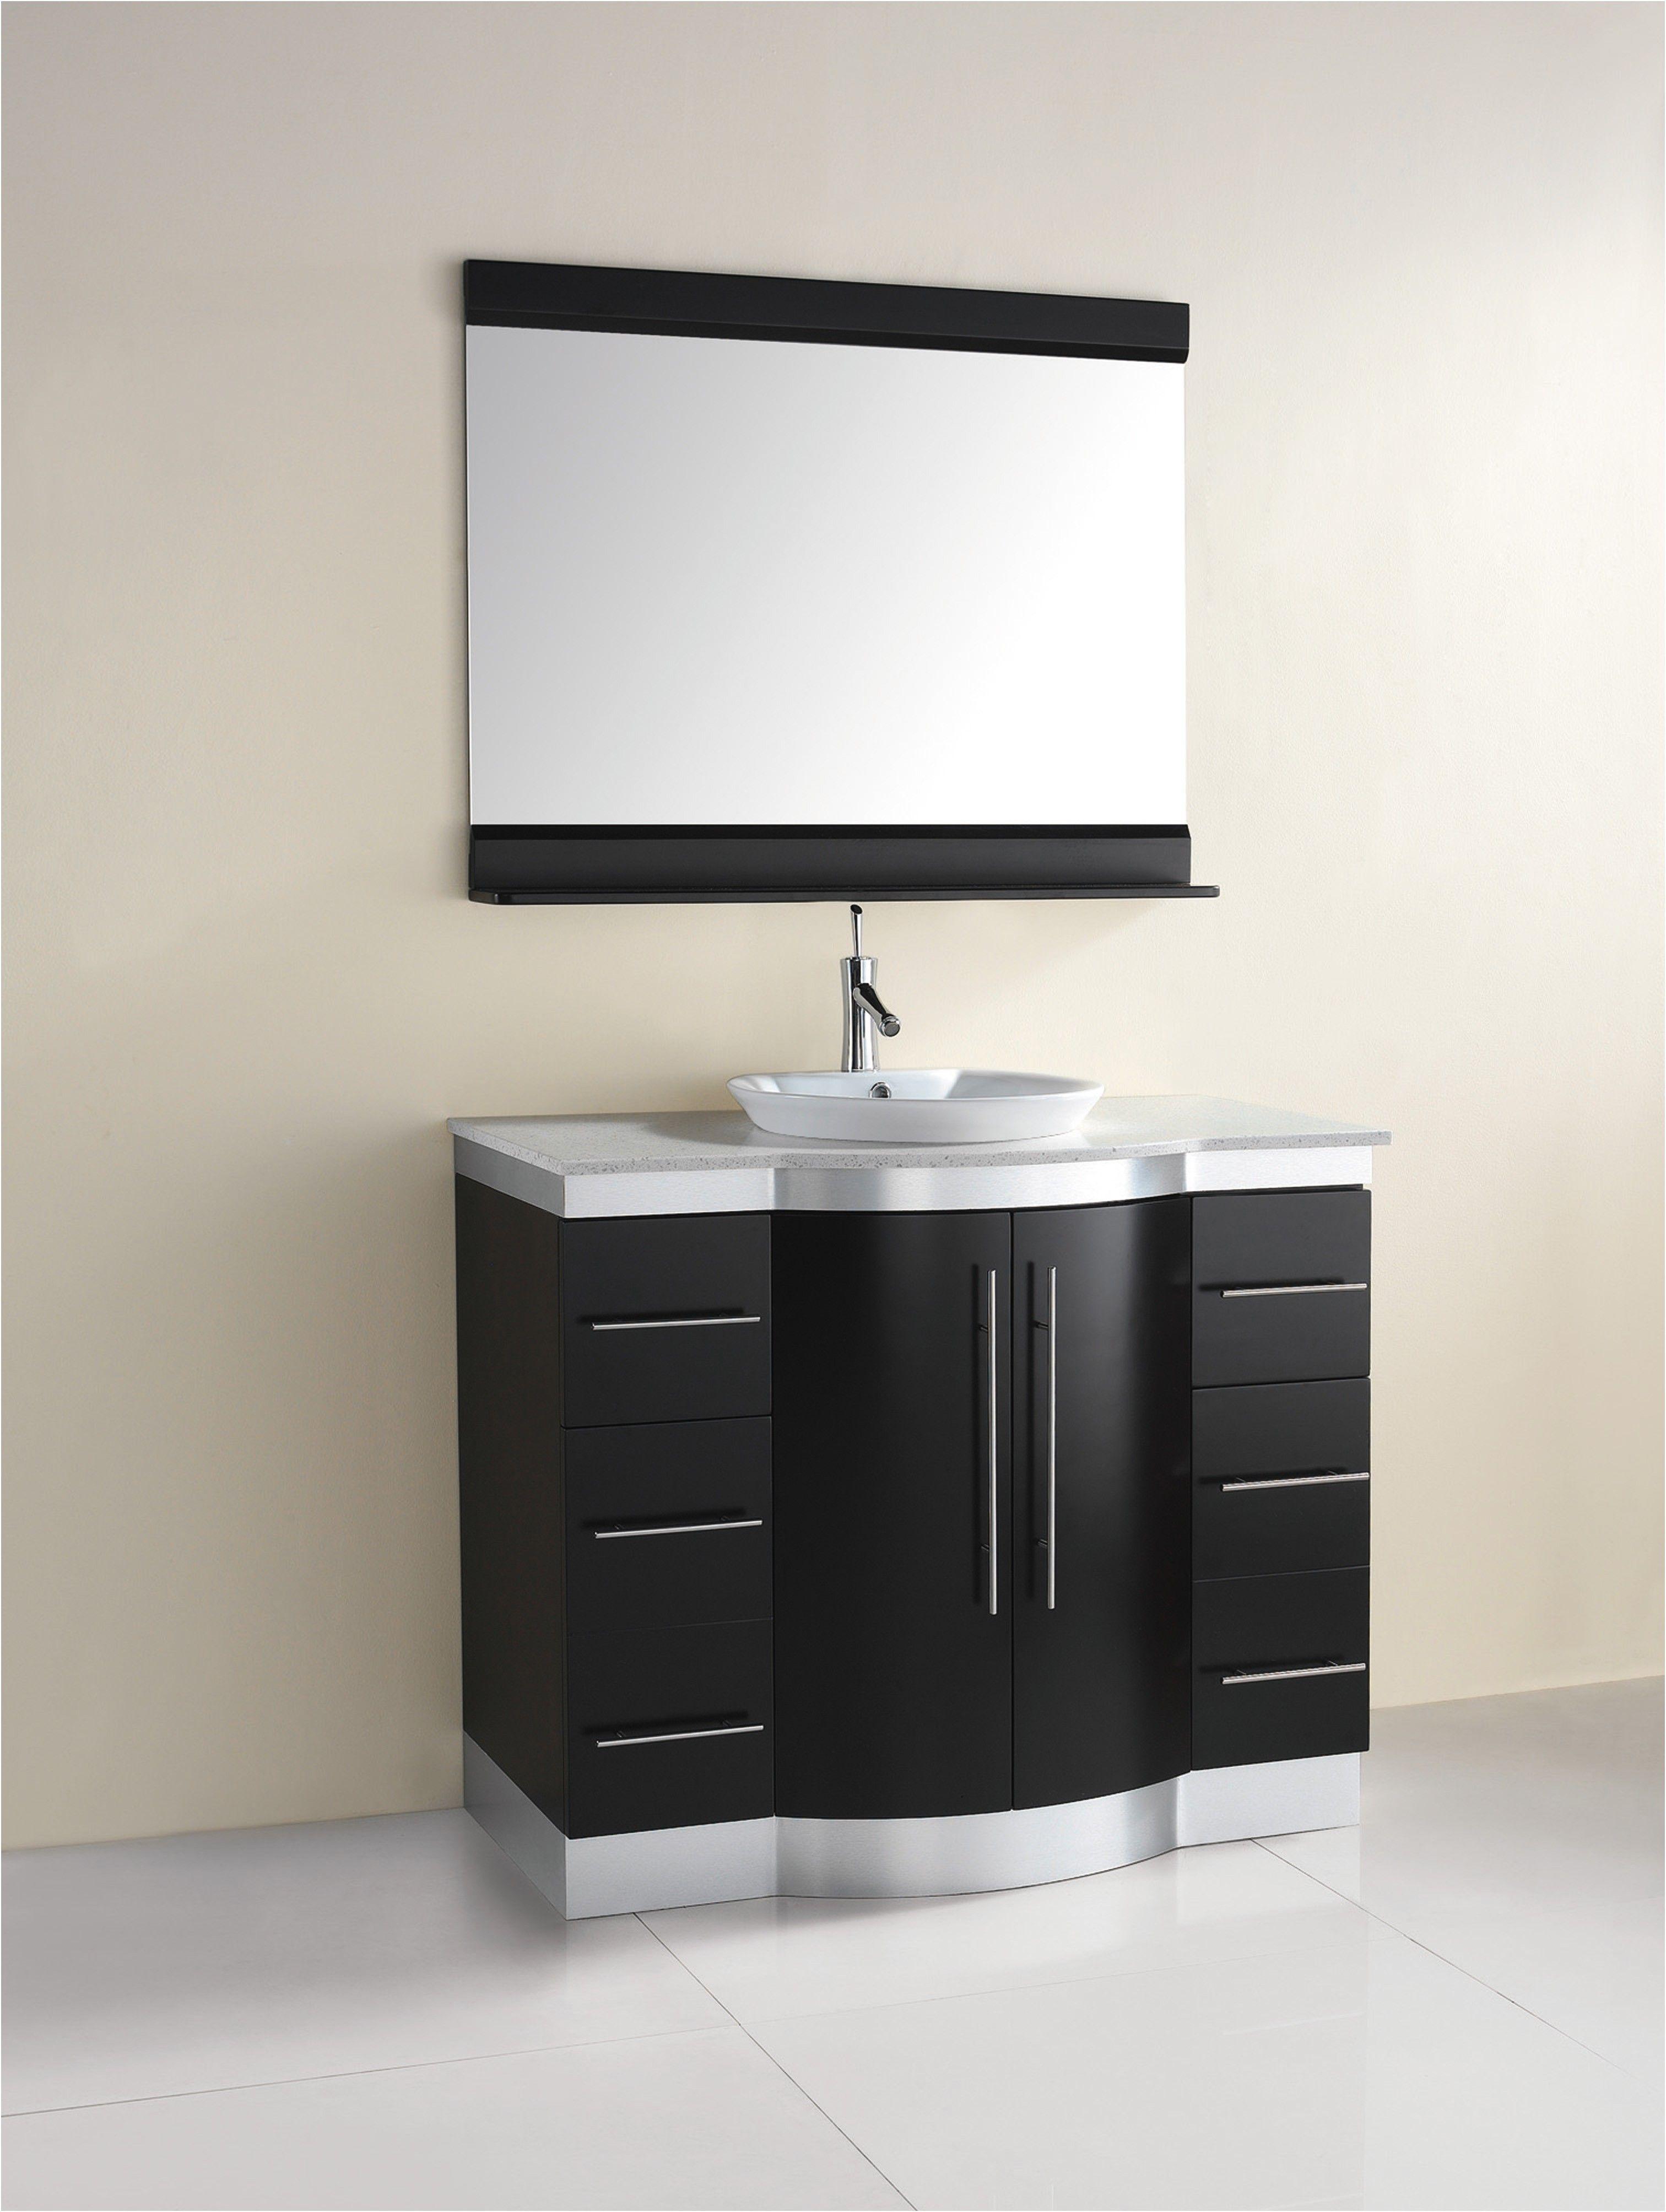 Superb Sears Bathroom Wall Cabinets Oak Bathroom Vanities Wood Download Free Architecture Designs Rallybritishbridgeorg